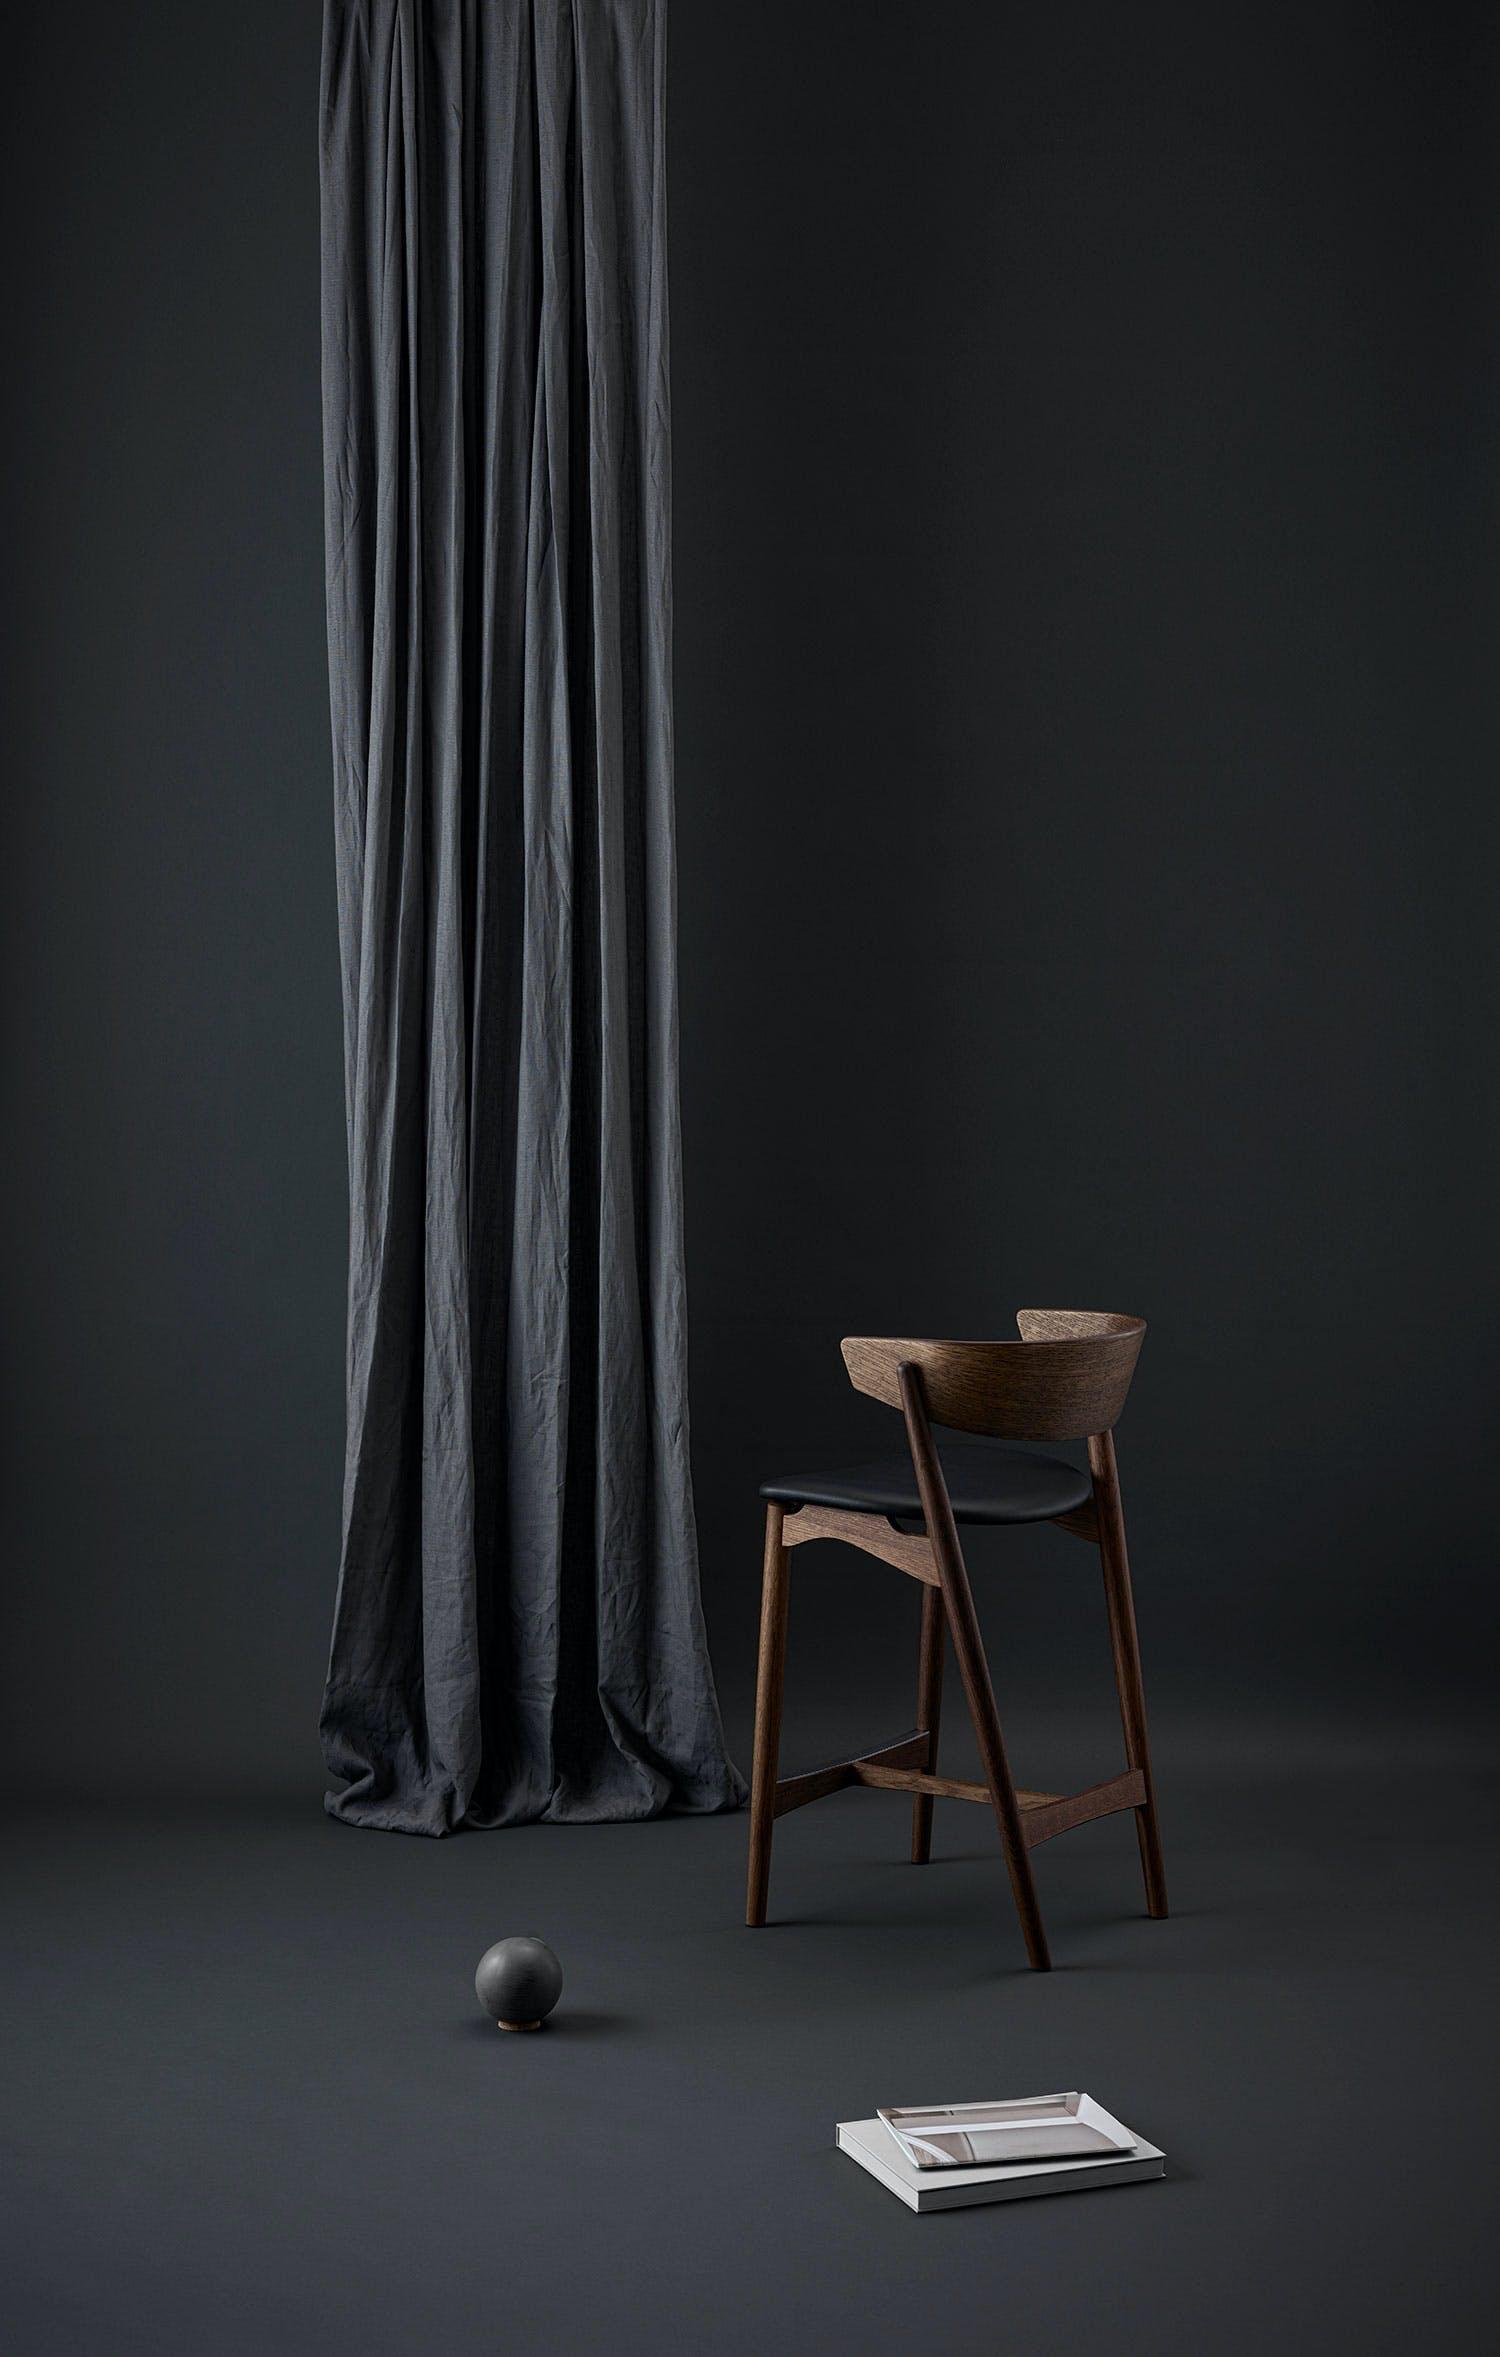 Hvorfor barstole?